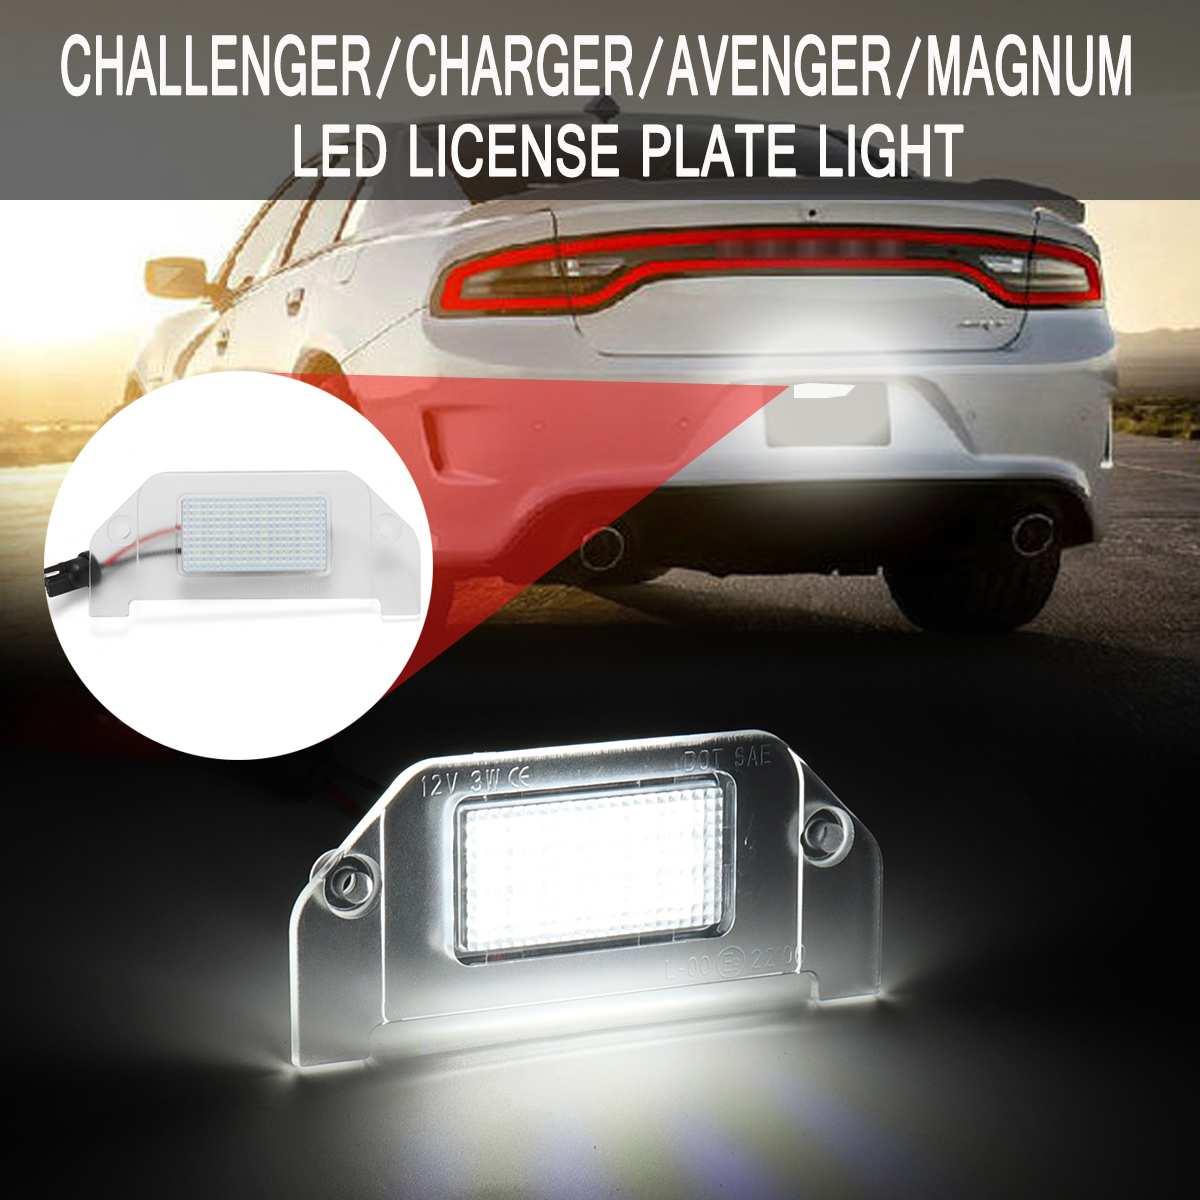 LED Car License Plate Light For Dodge Challenger Charger